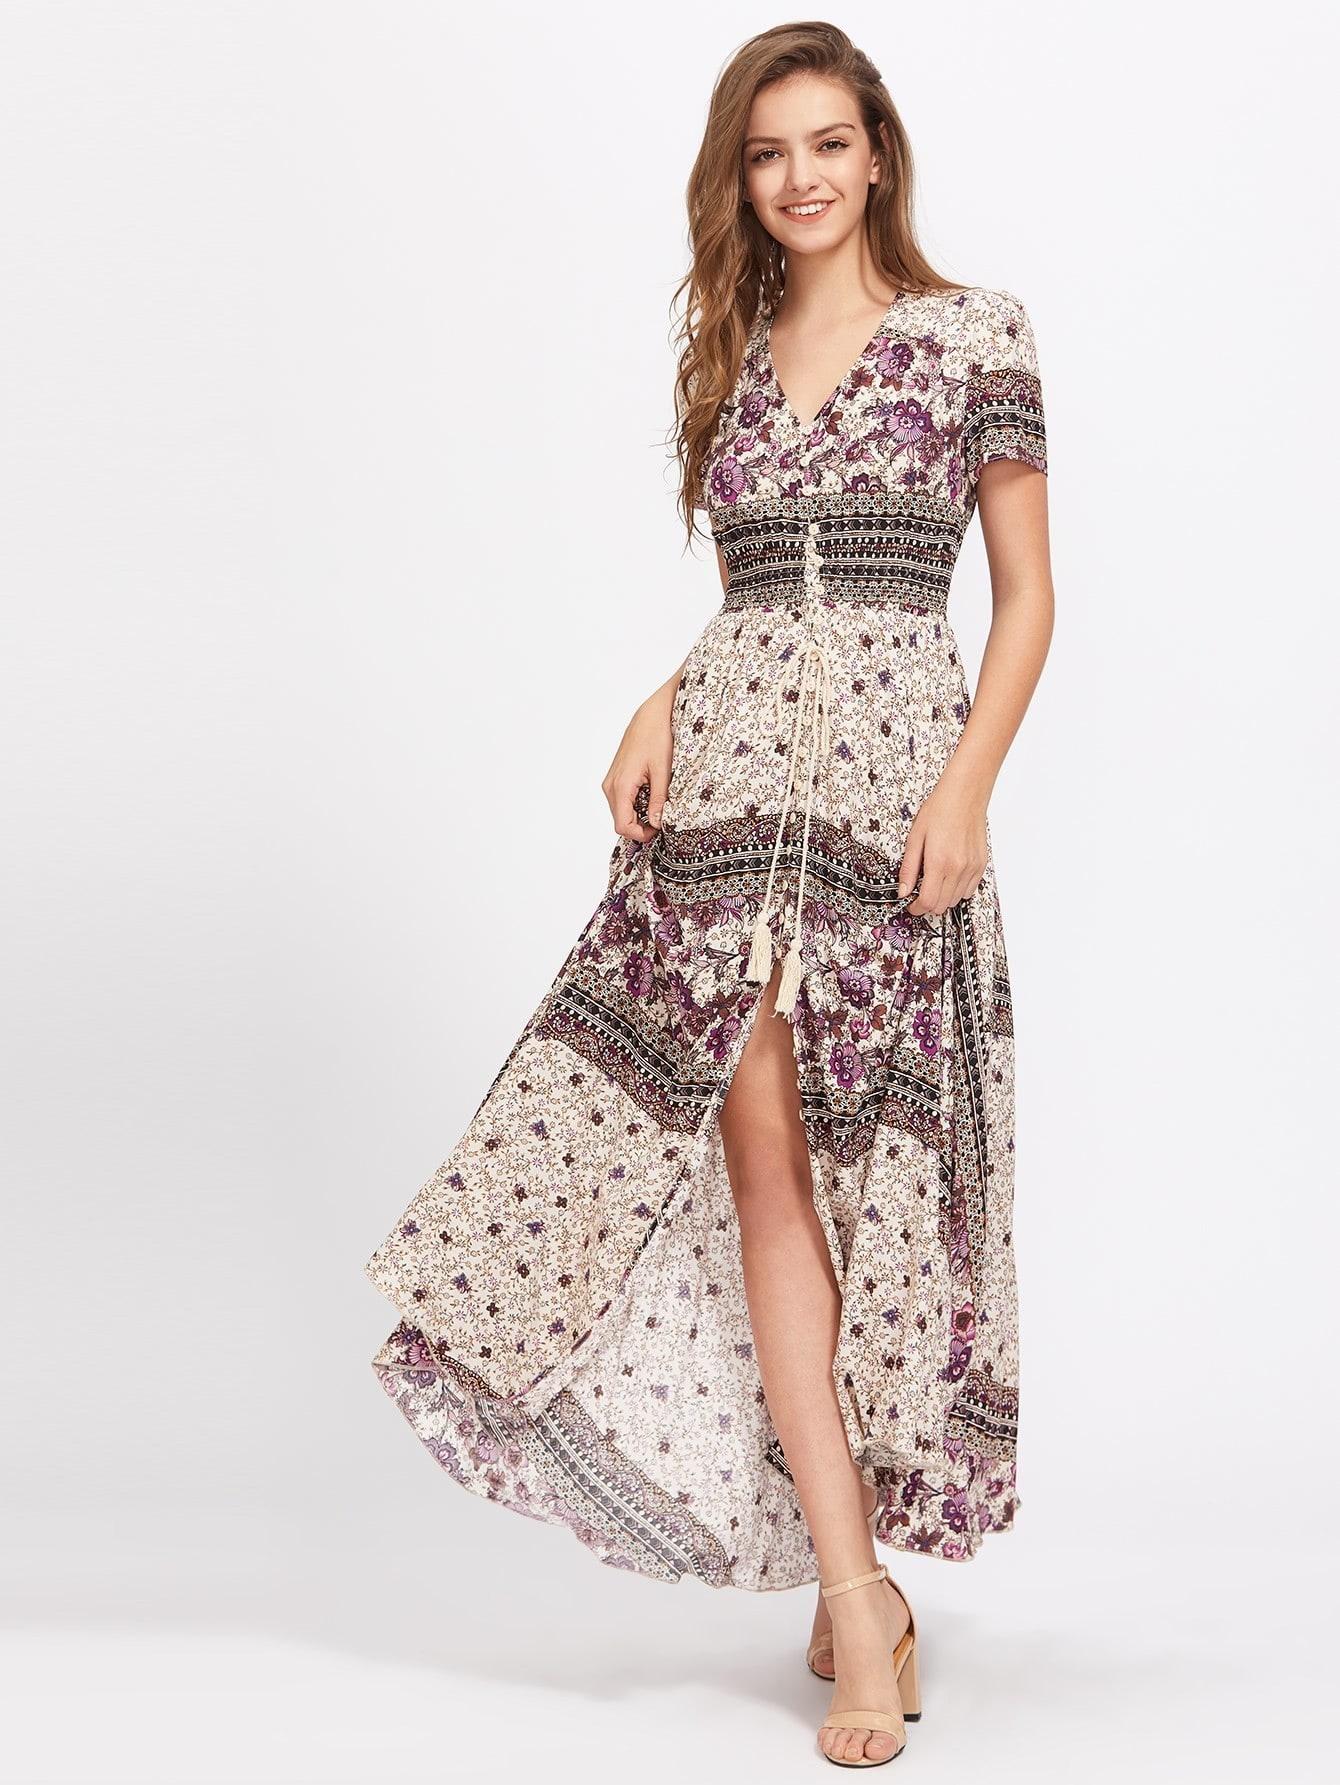 Tasseled Tie Smocked Waist Mixed Print Dress mixed print dress